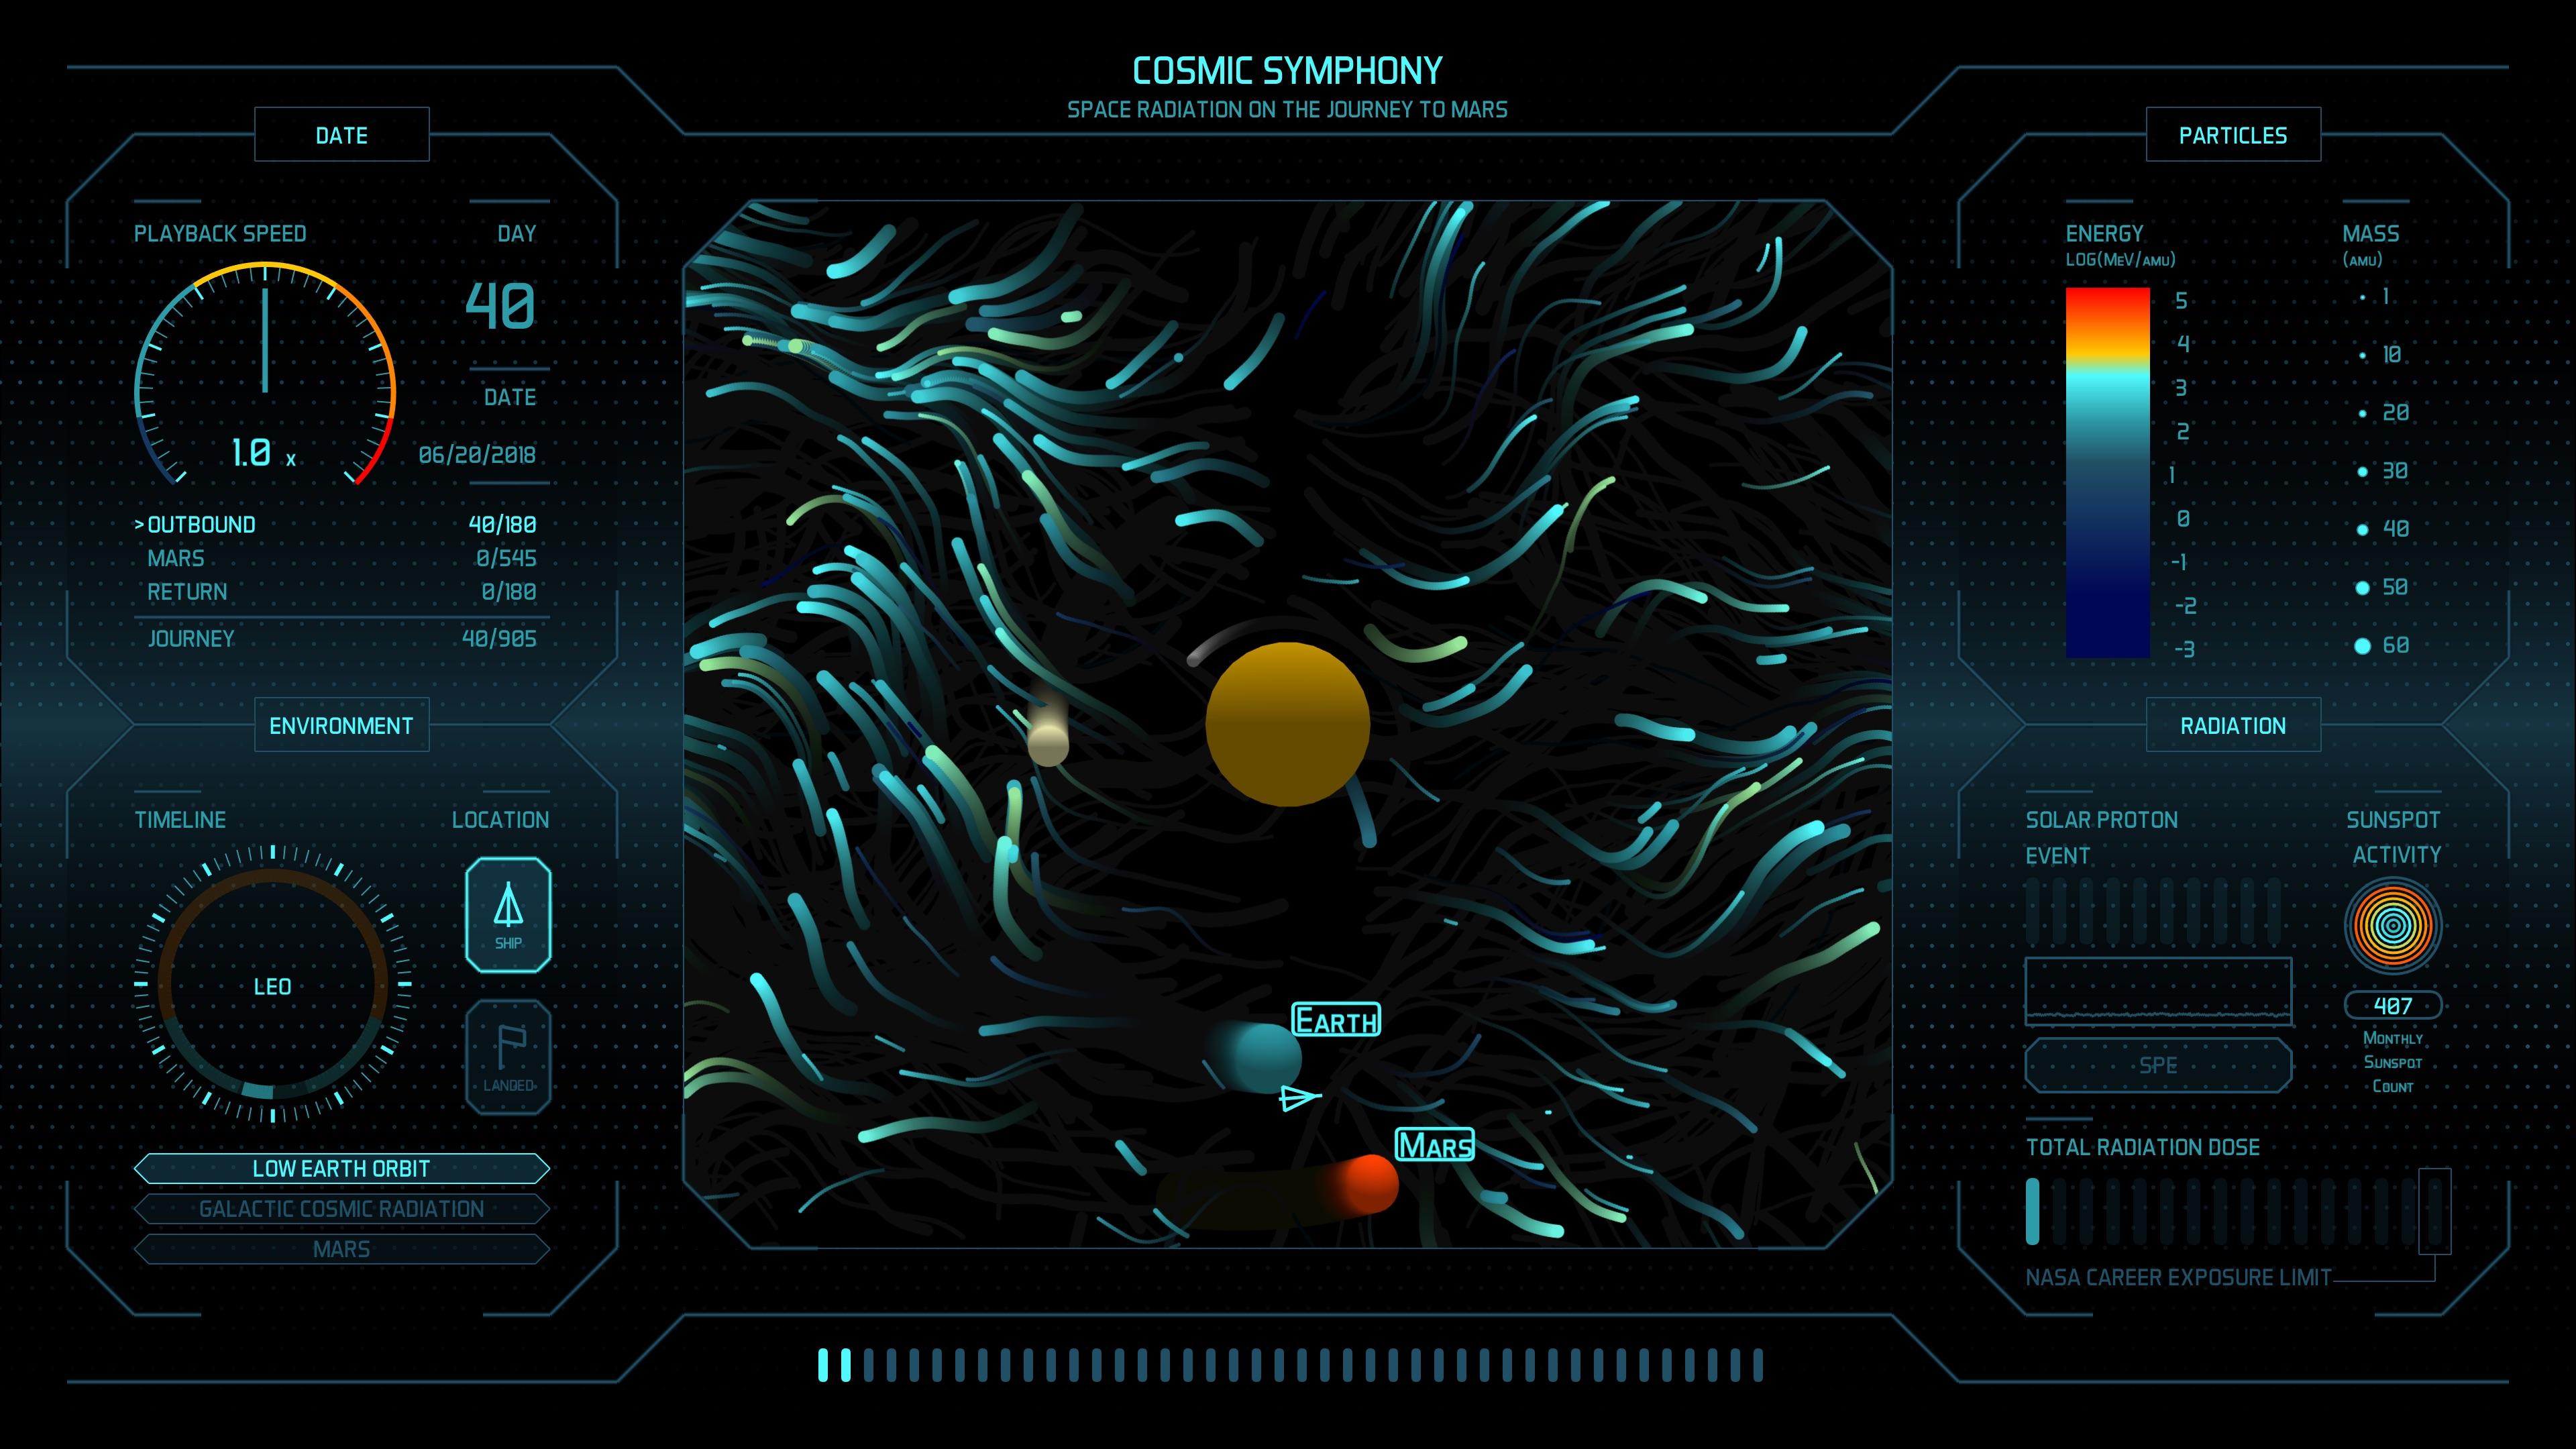 Cosmic Symphony NASA